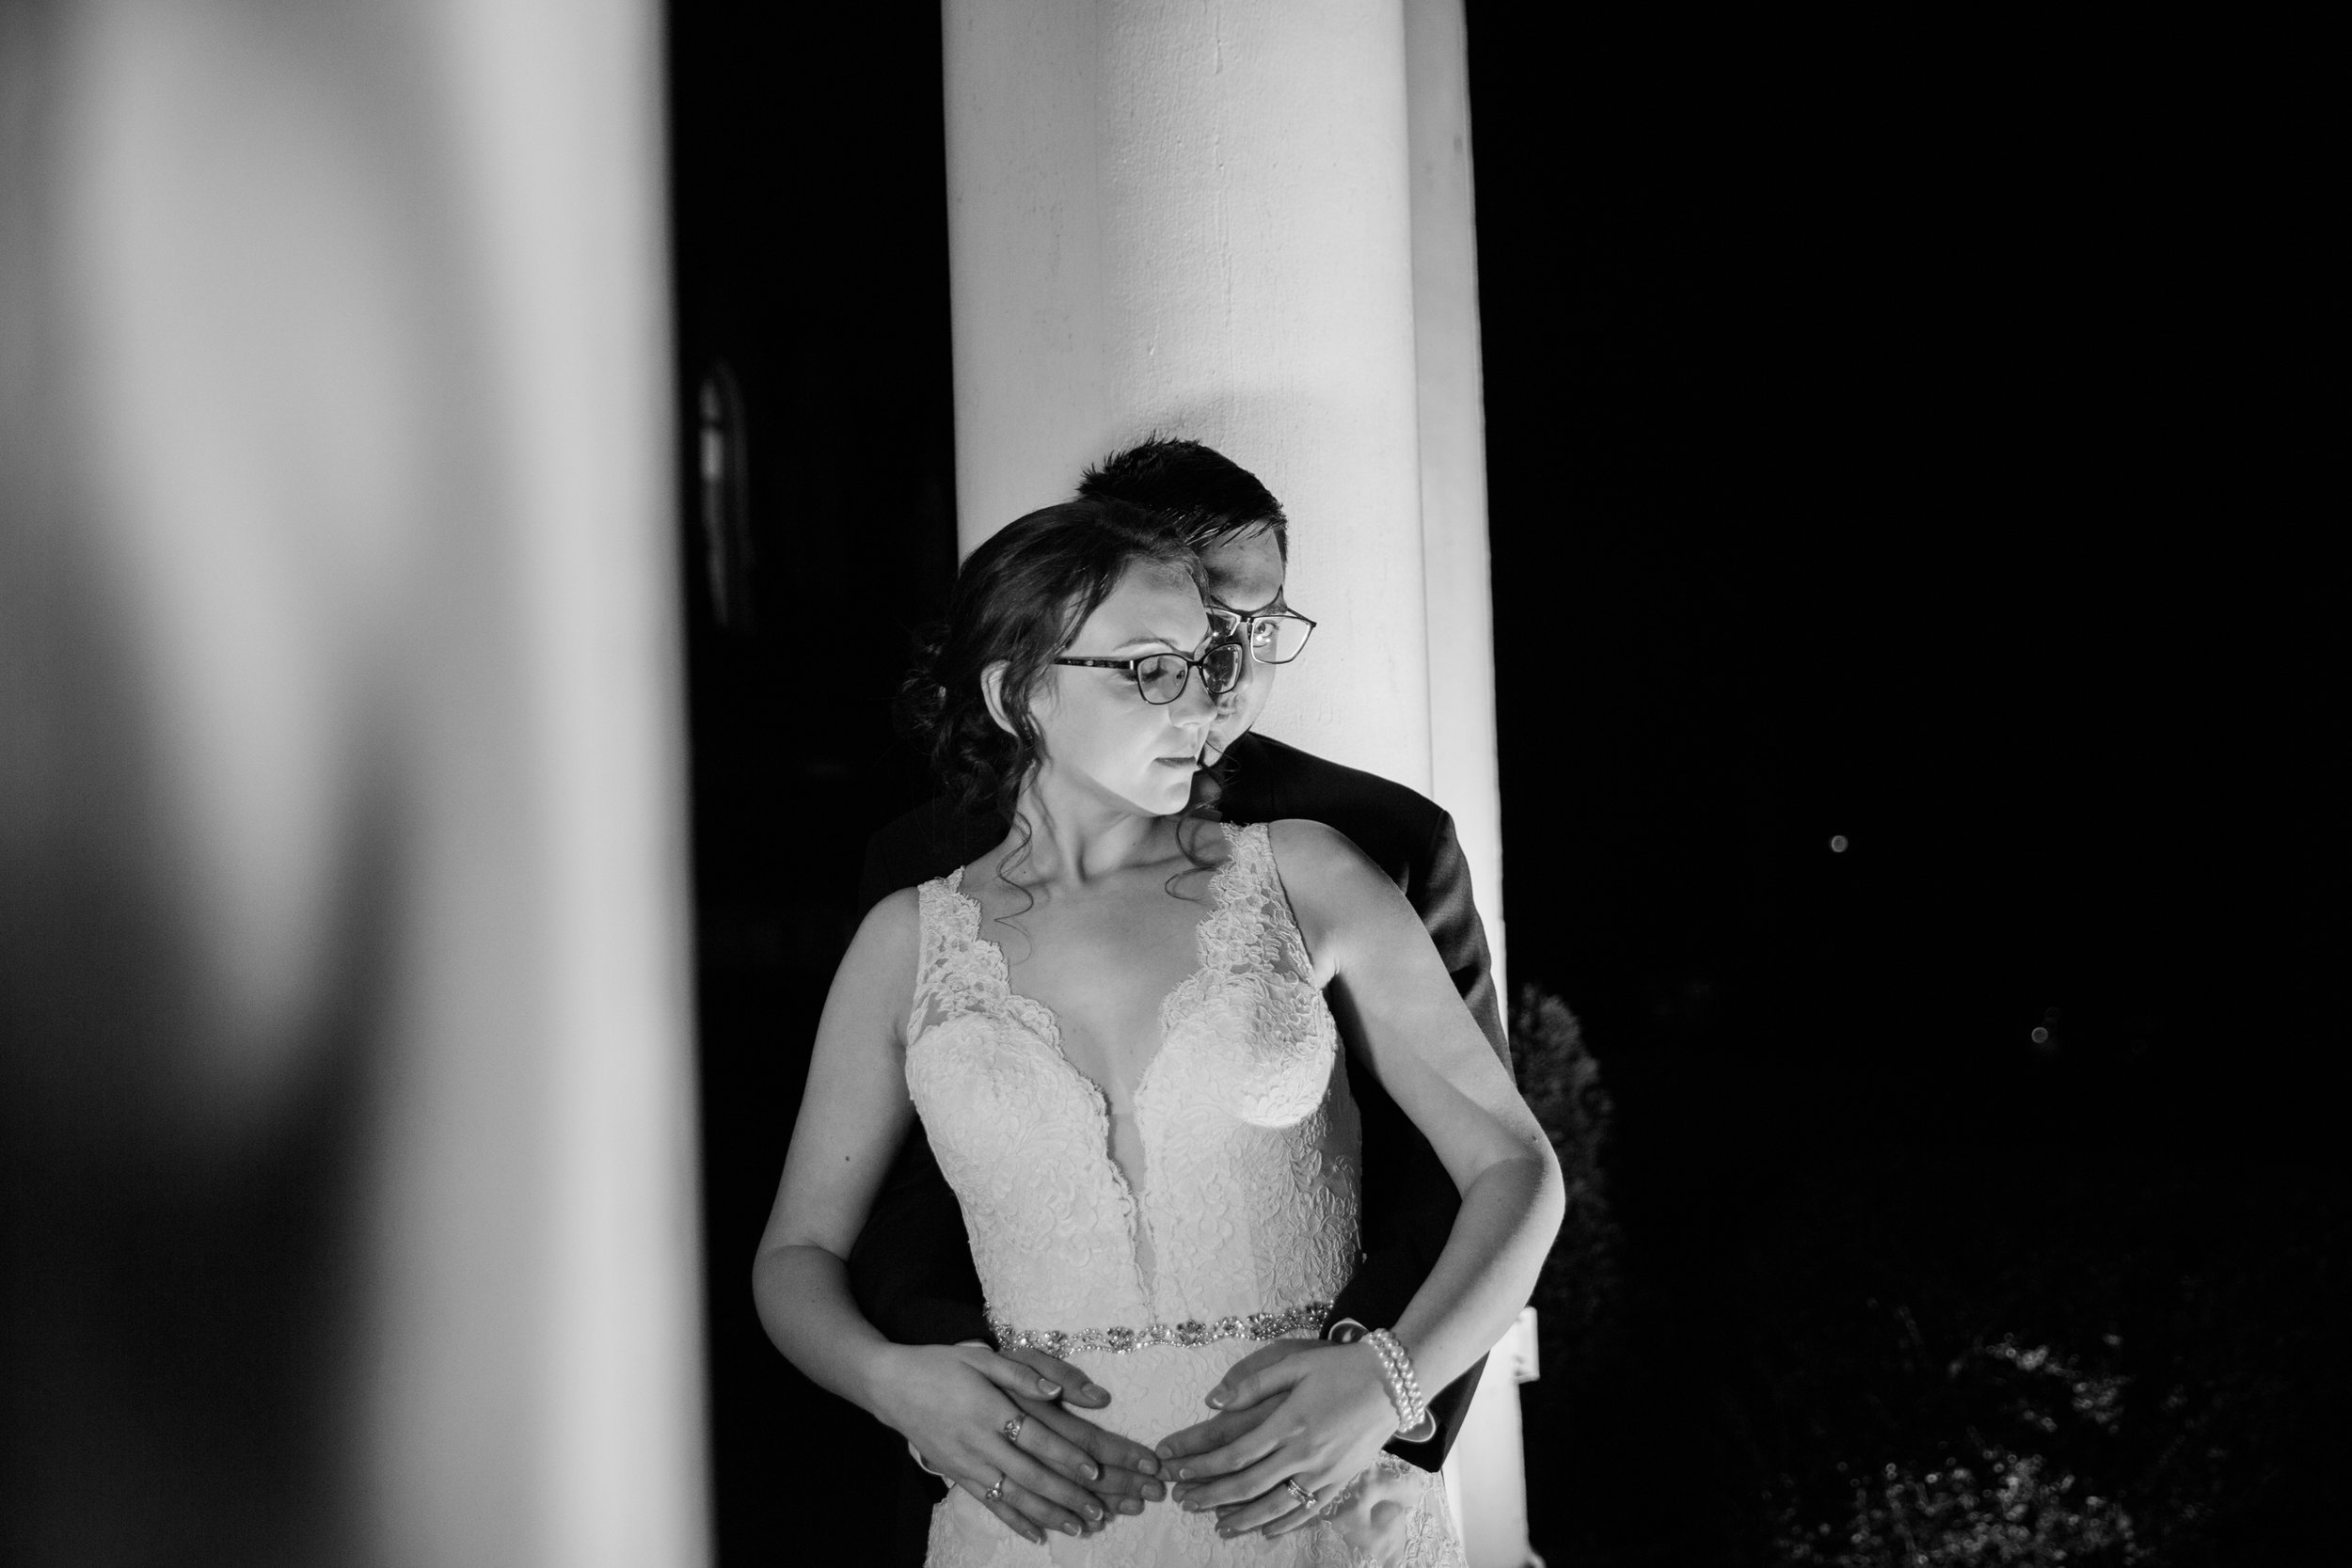 Harry Potter Wedding at Overhills Mansion Catonville Maryland Wedding Photographers Megapixels Media (115 of 134).jpg